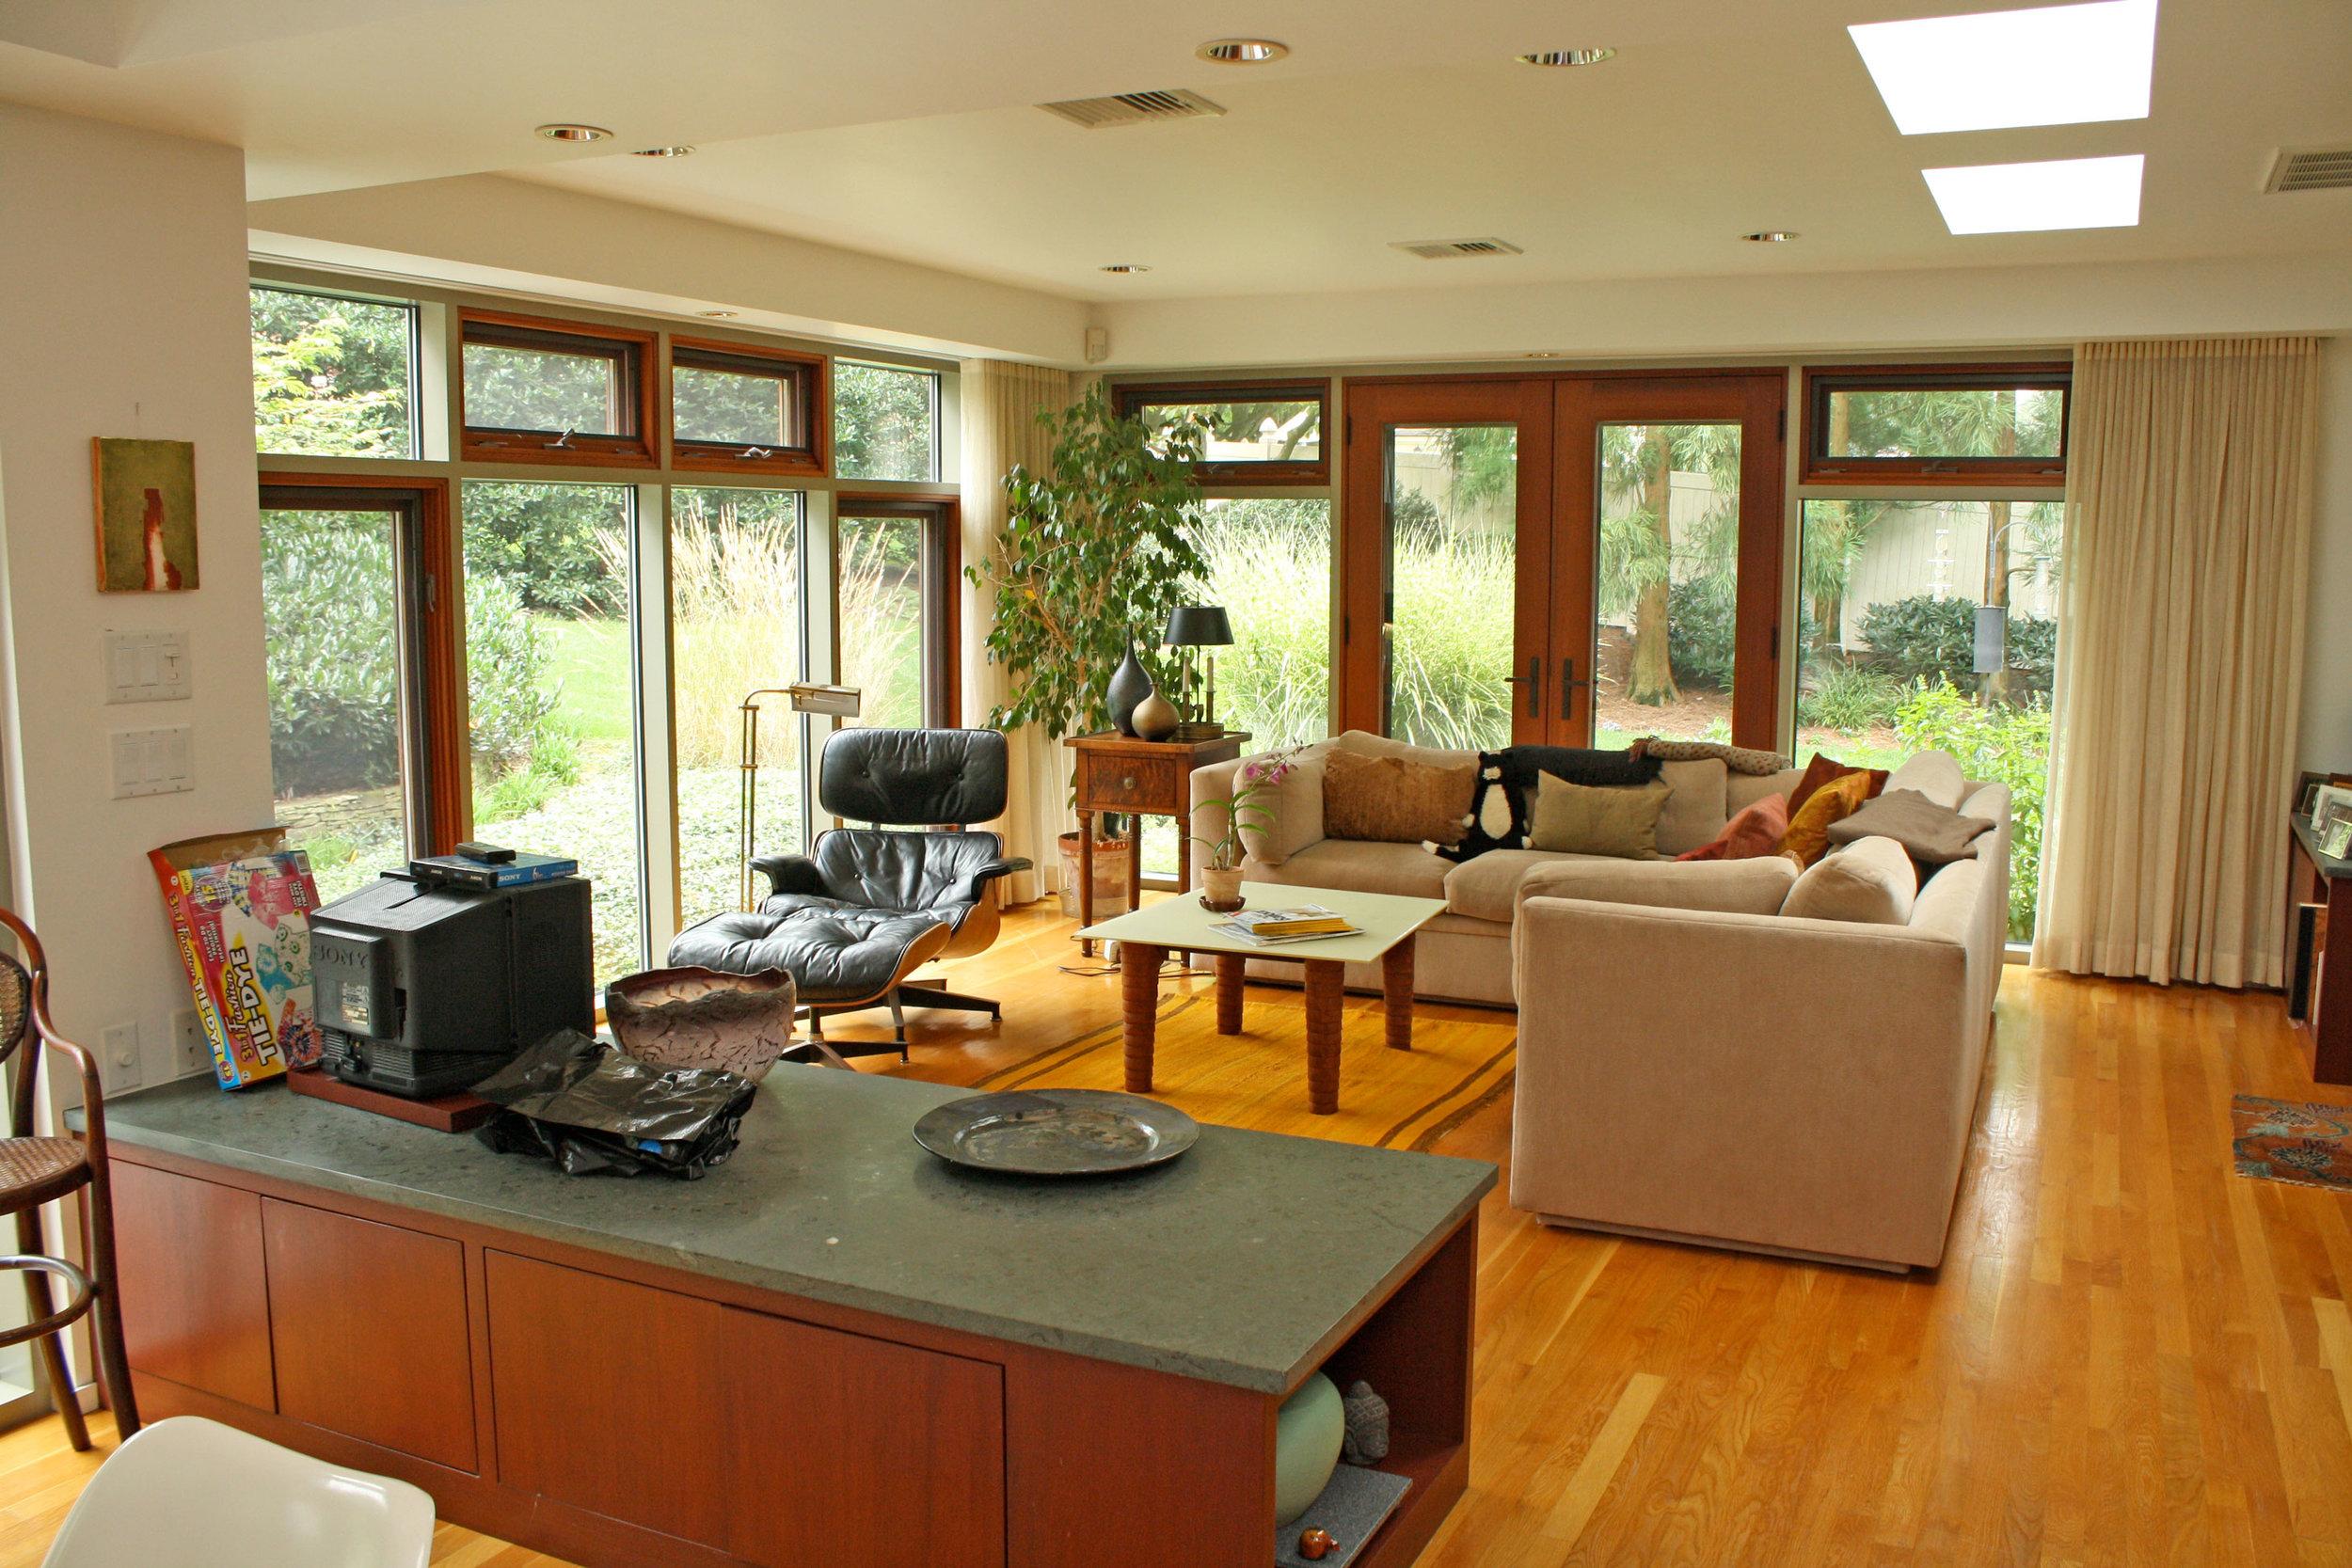 craftsmen-living-room.jpg